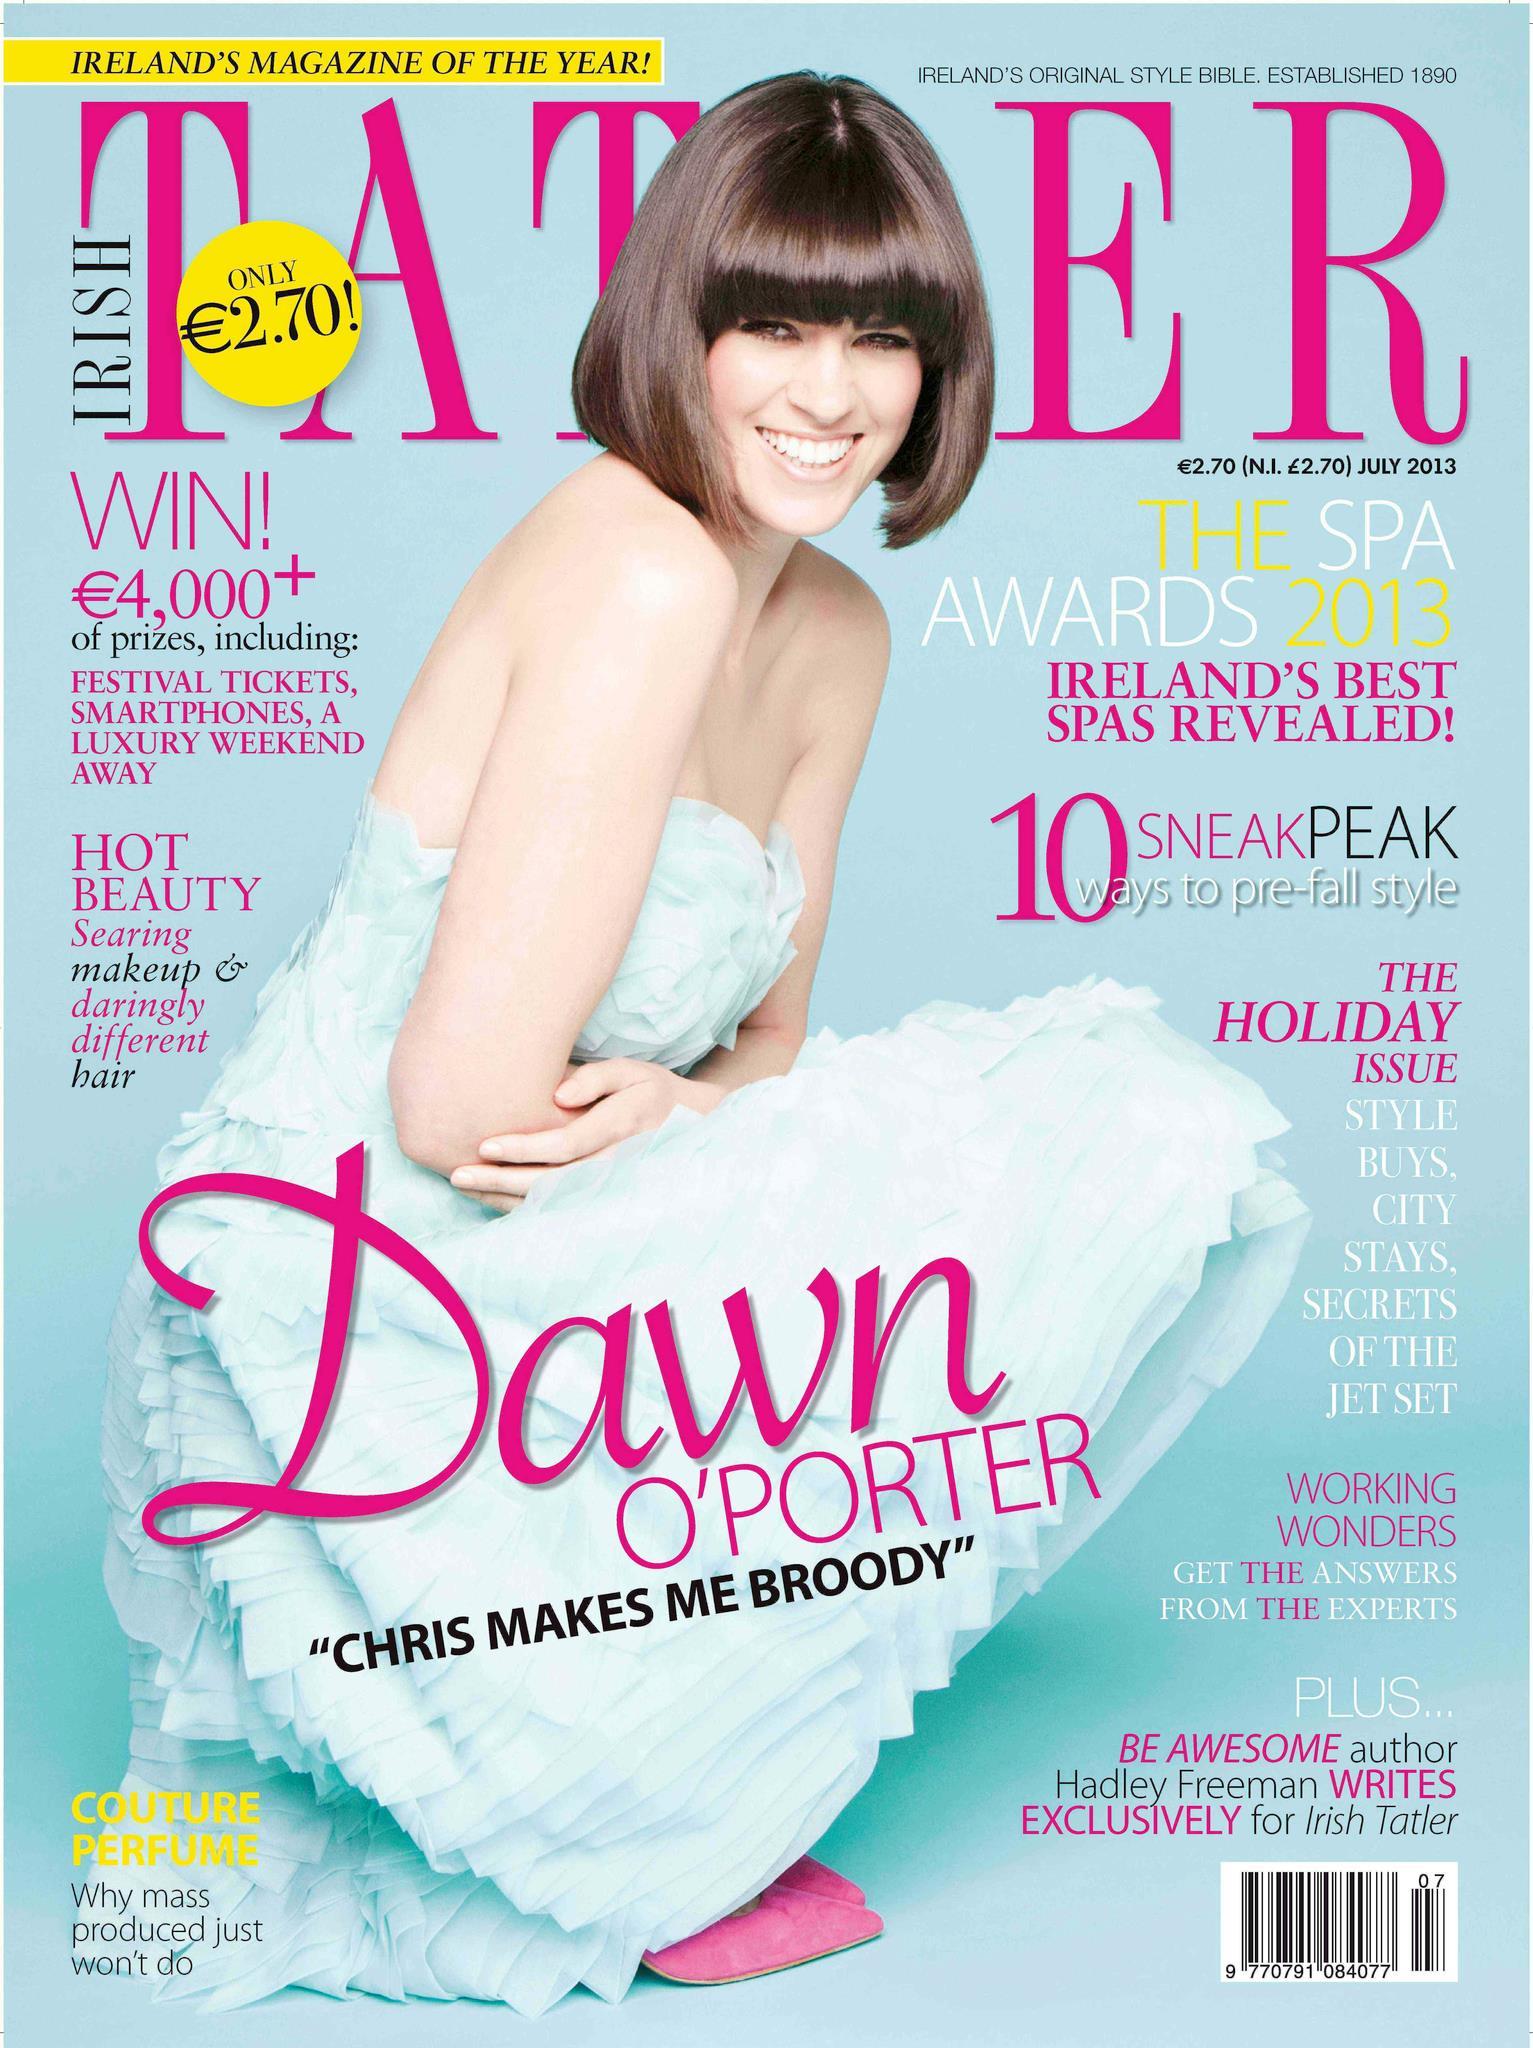 Irish Tatler - July 2013 Cover